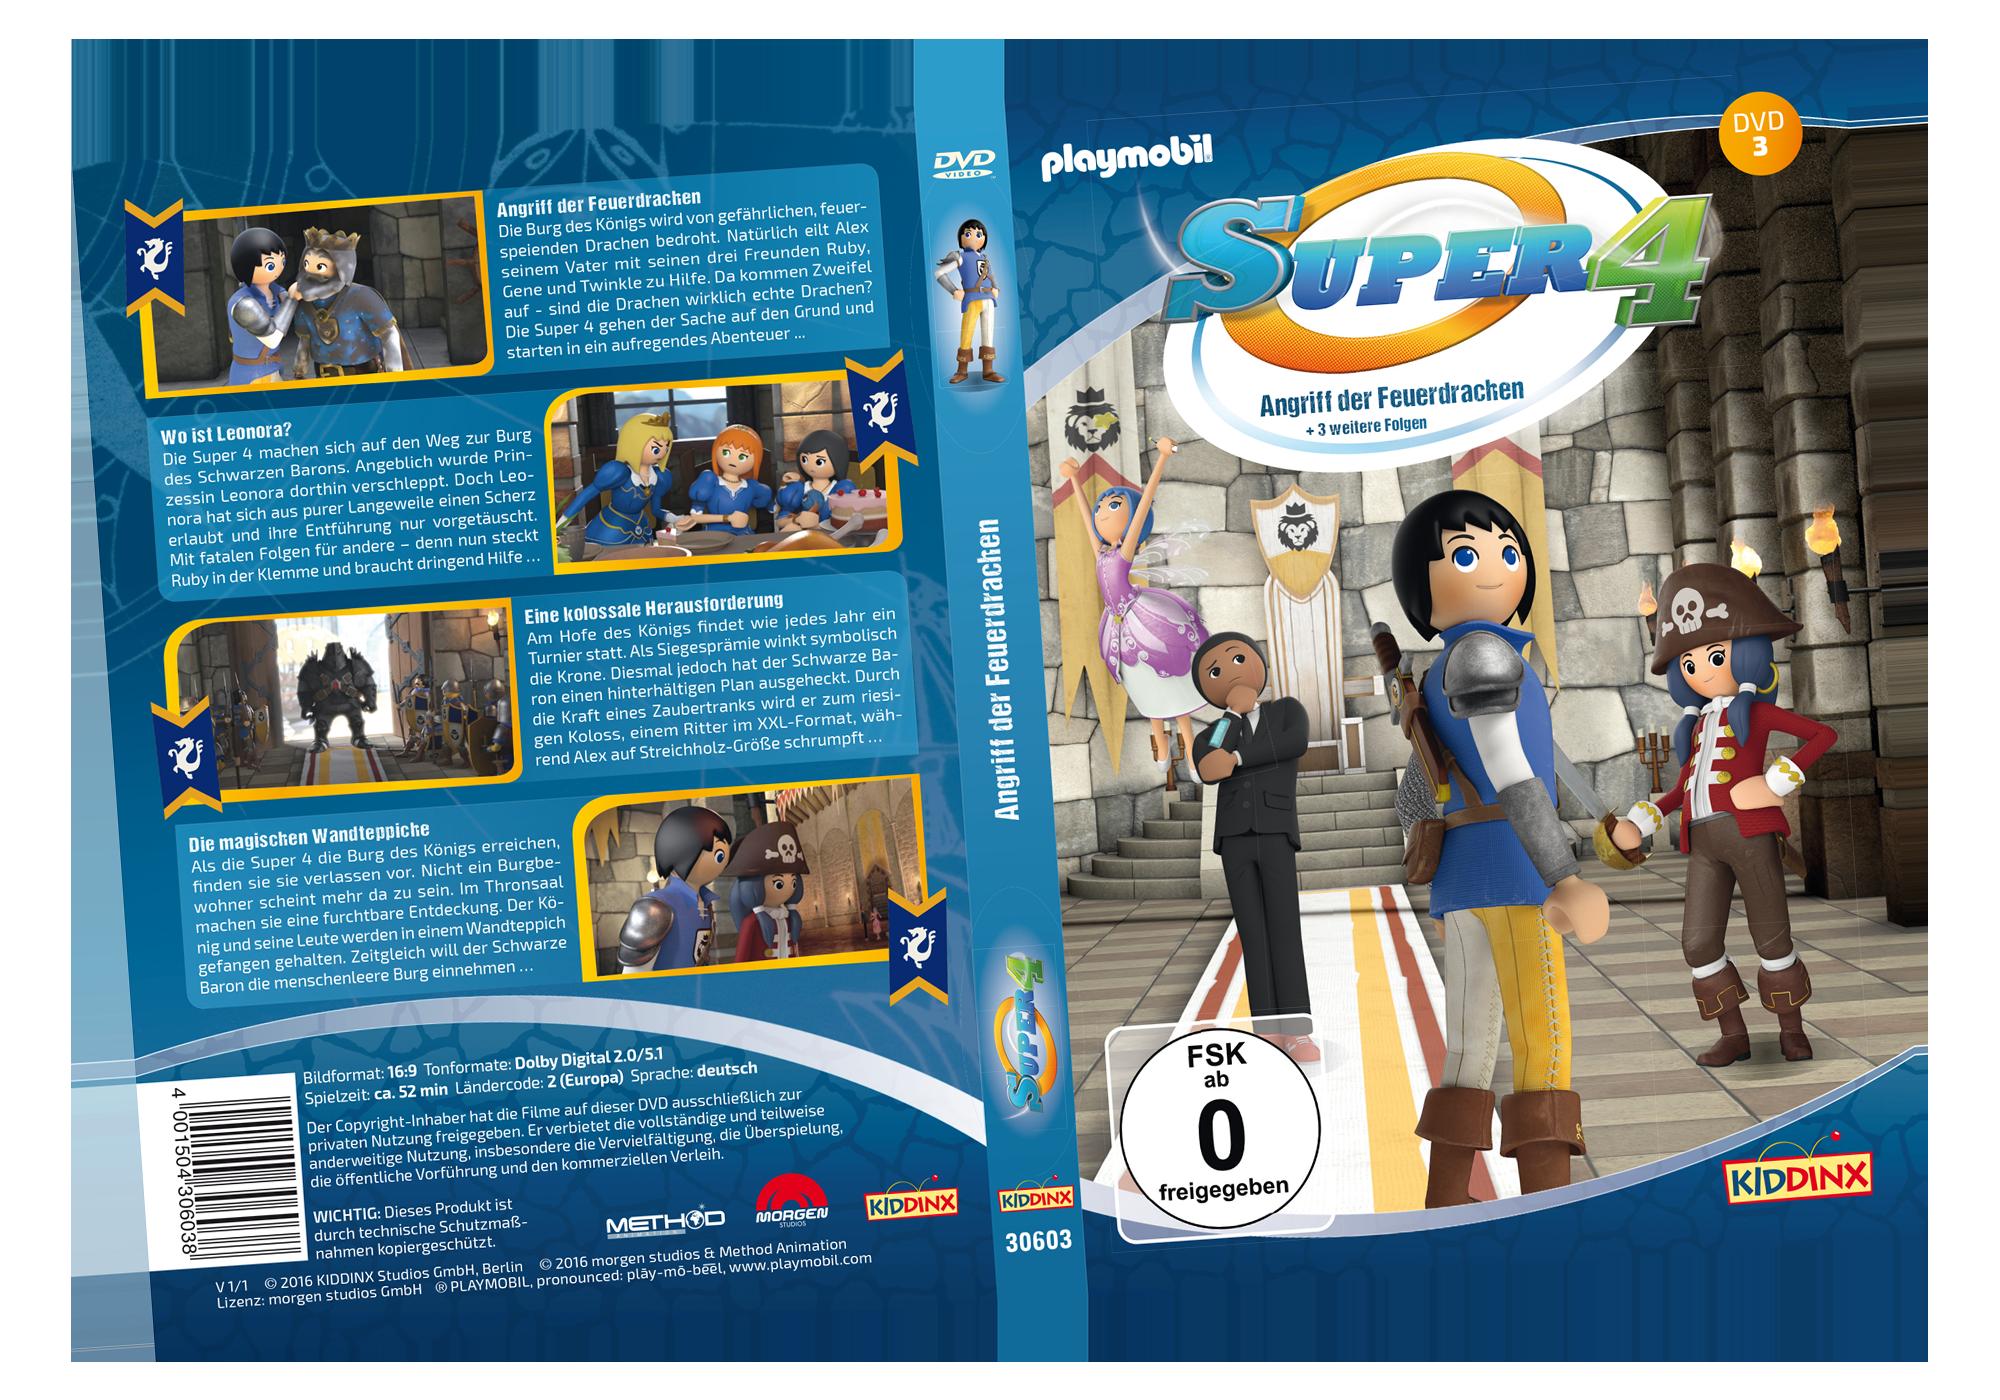 http://media.playmobil.com/i/playmobil/80478_product_detail/DVD 3 Super4: Angriff der Feuerdrachen